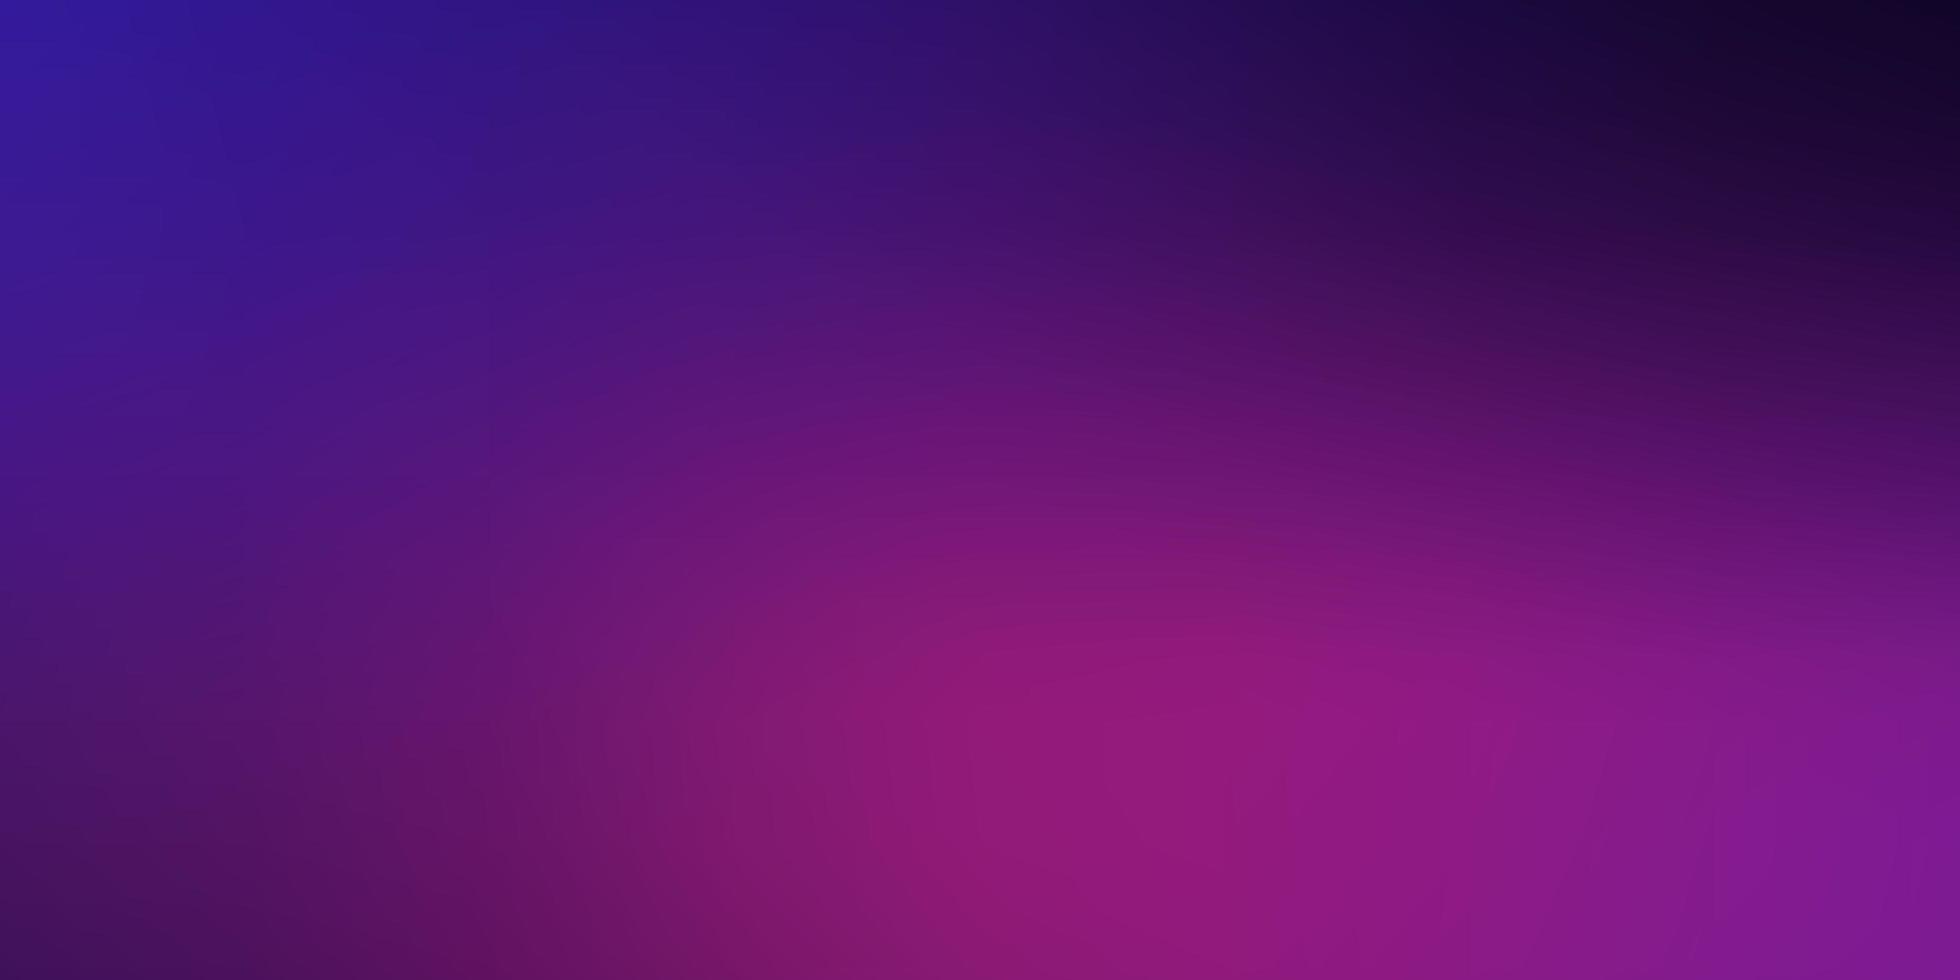 dunkelviolettes, rosa Vektor verschwommenes Muster.